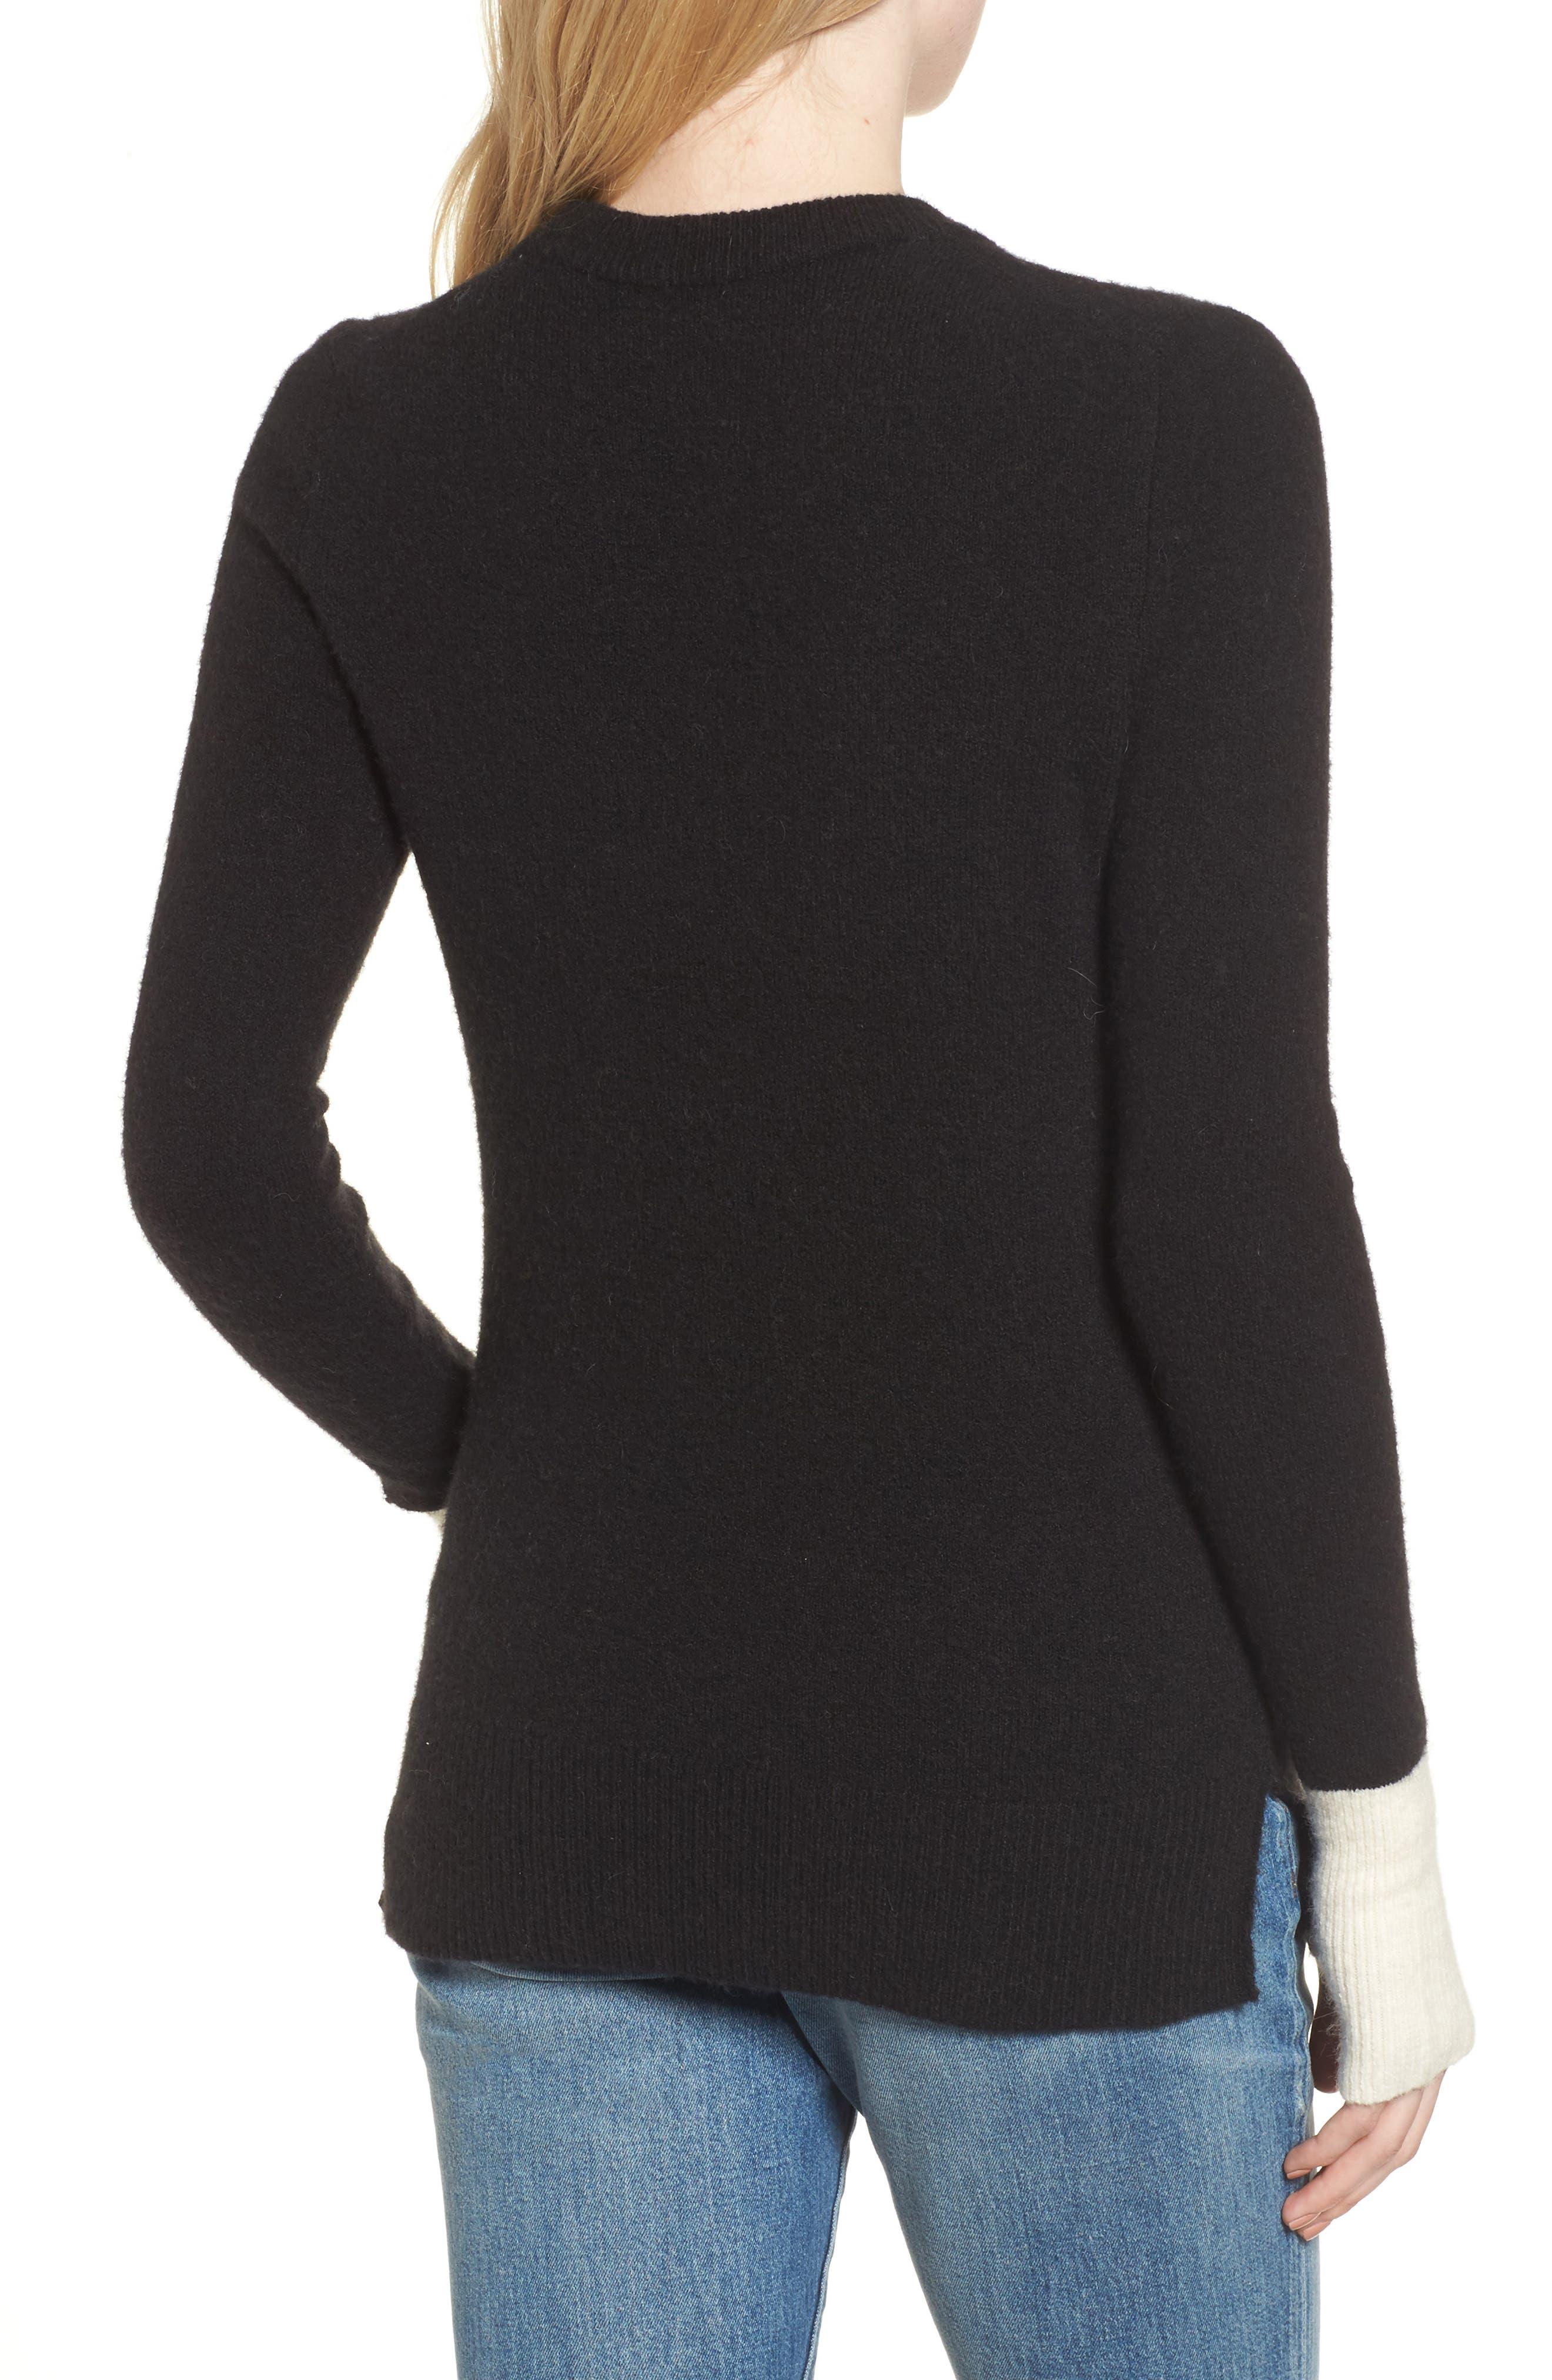 Fremont Colorblock Pullover Sweater,                             Alternate thumbnail 3, color,                             True Black